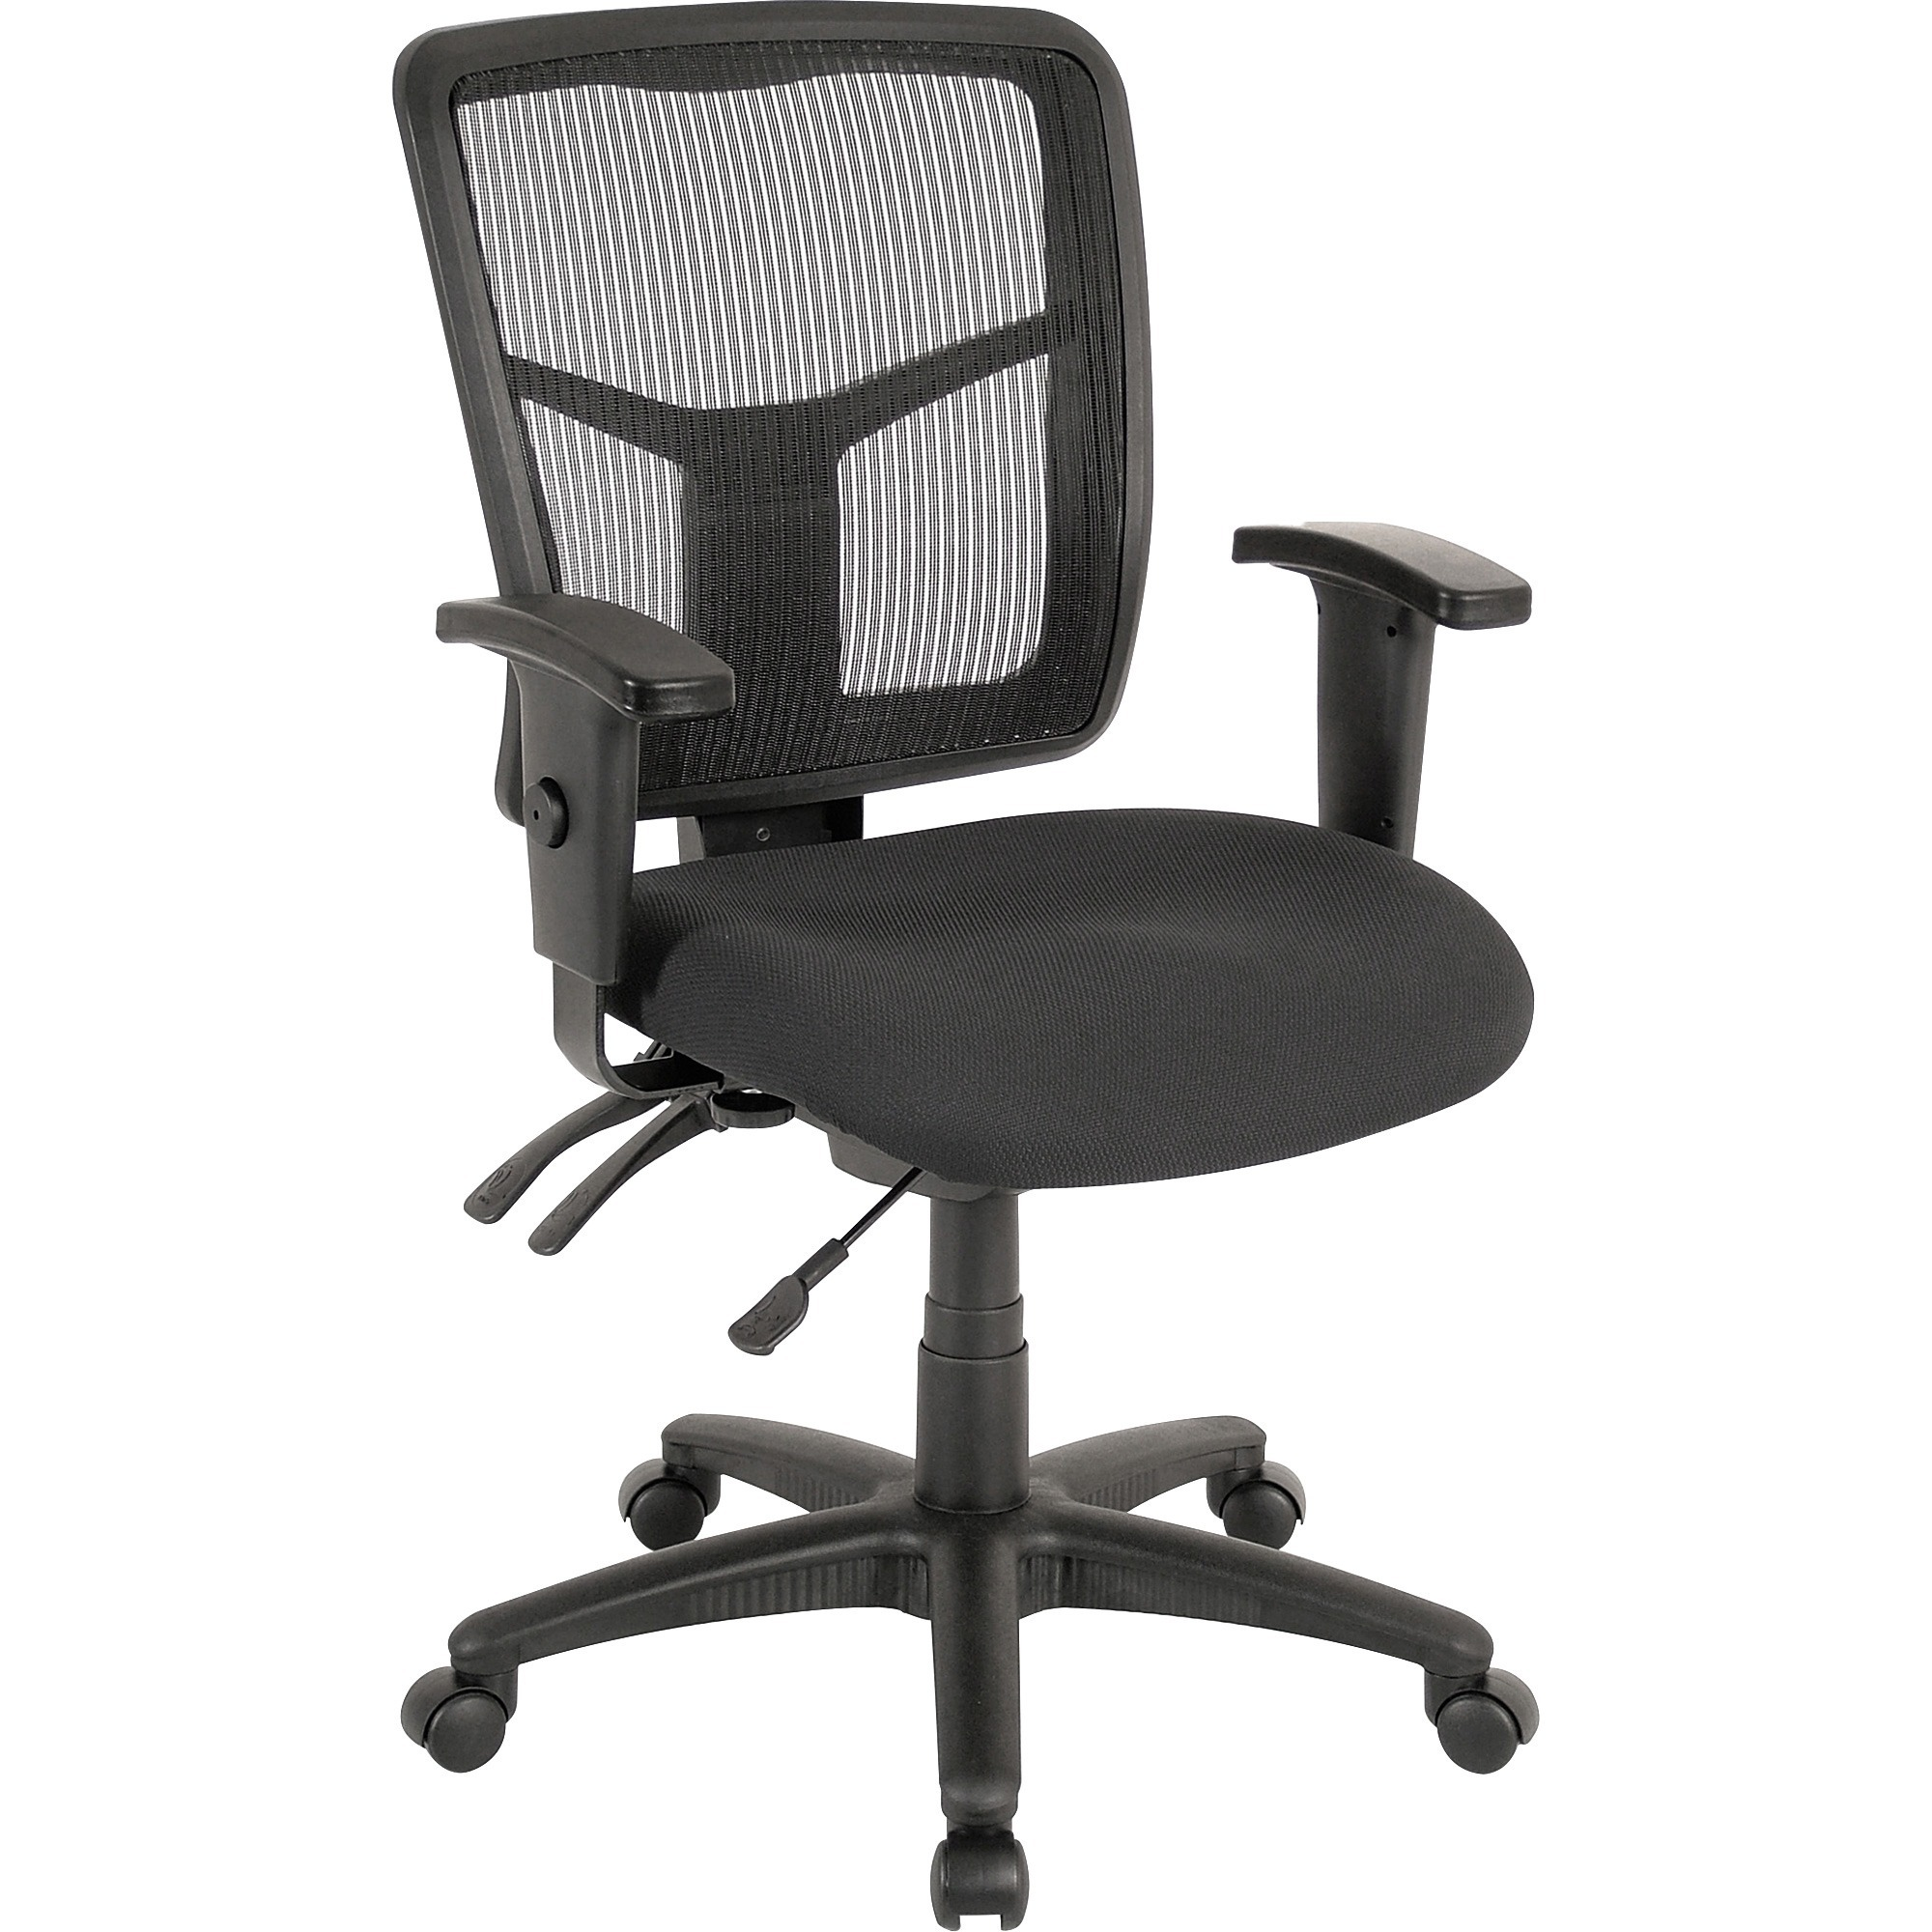 Lorell Ergomesh Series Managerial Mid-back Chair - Fabric Black Seat - Black Back - Black Frame - 5-star Base - 20 Seat Width X 18.70 Seat Depth - 25.3 Width X 23.5 Depth X 40.5 Height